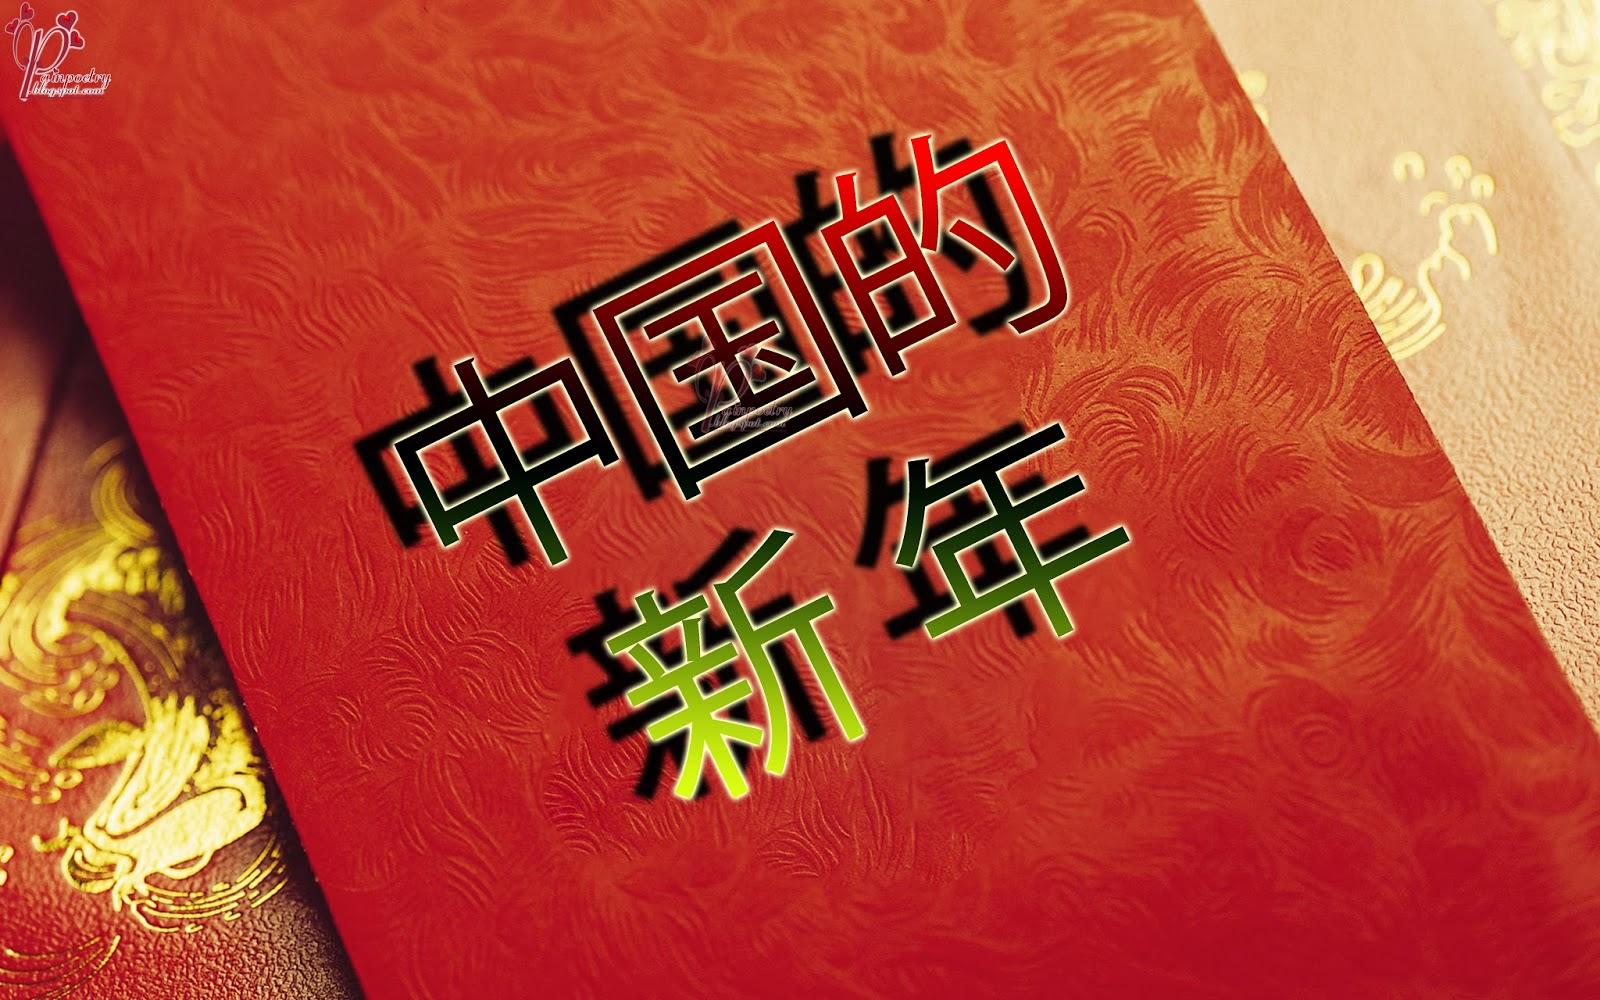 Chinese-Happy-New-Year-Wish-Image-Wide